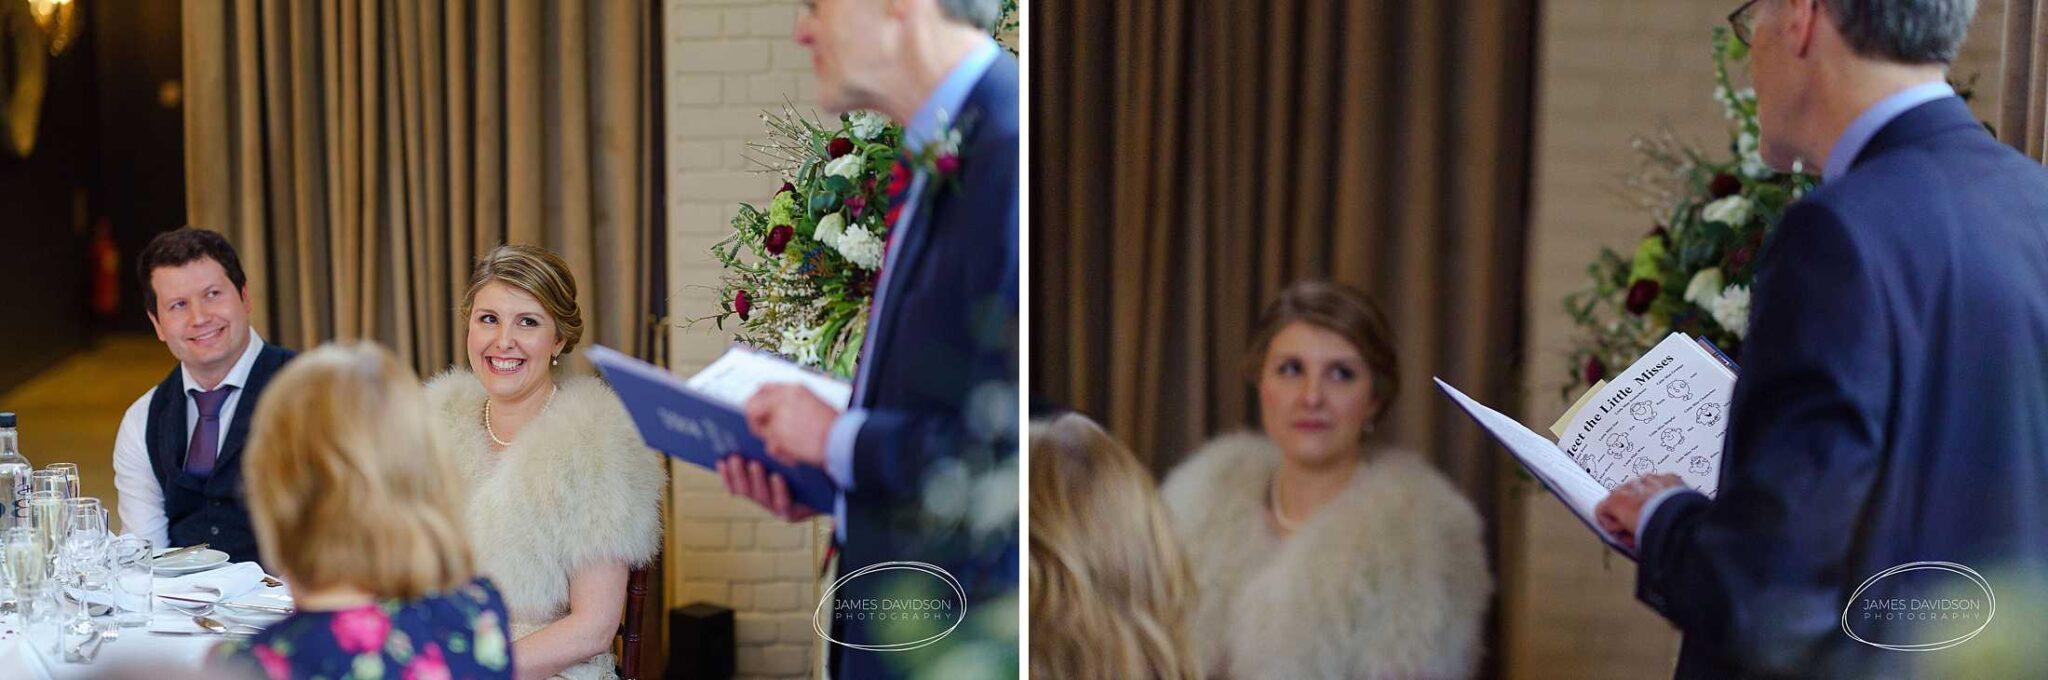 seckford-hall-wedding-071